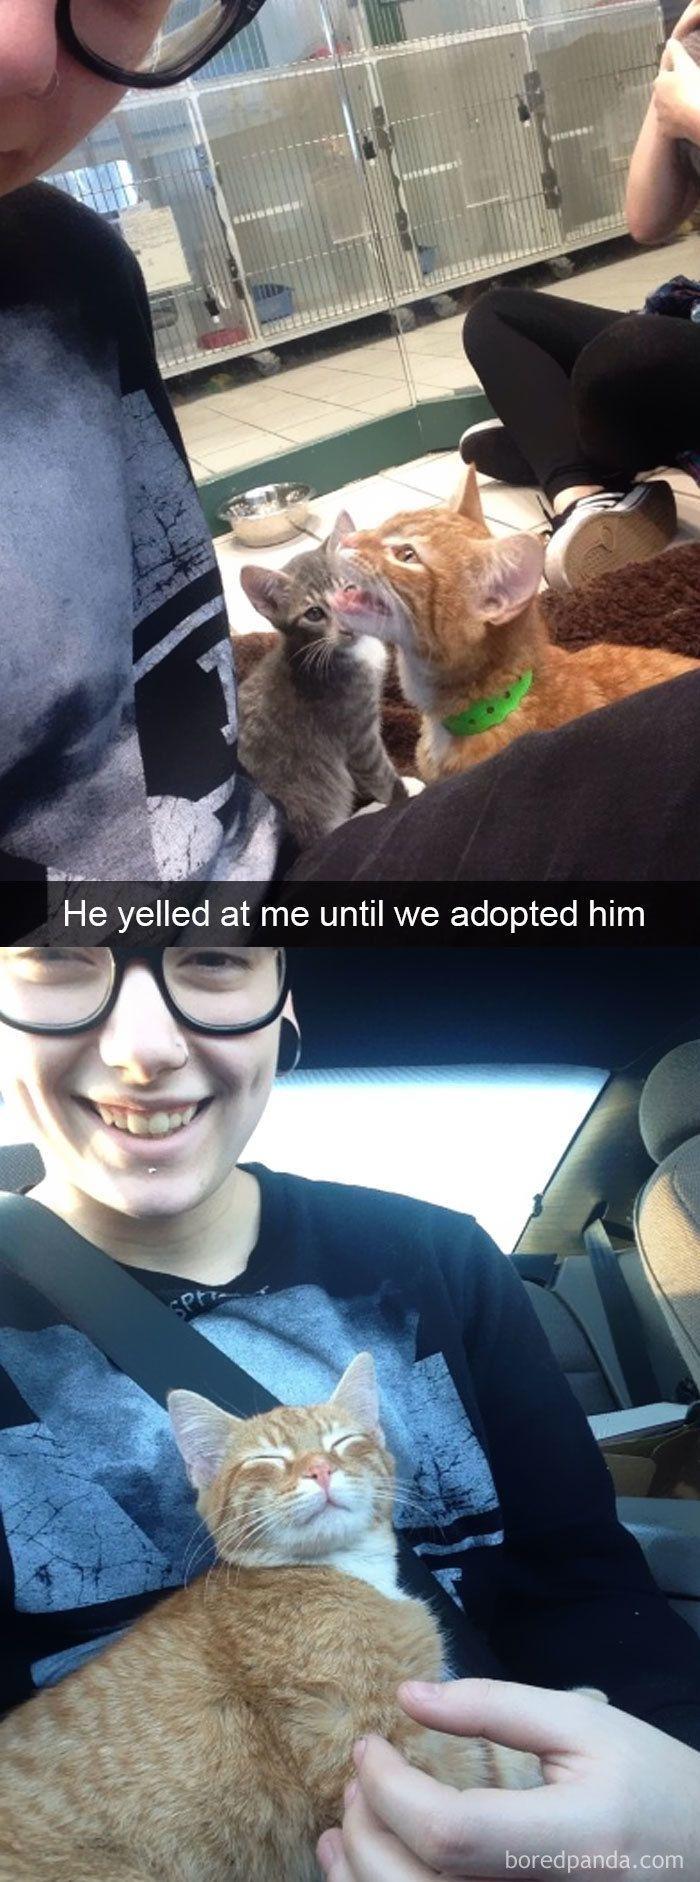 Lustige Katze Bilder – Haustiere – #Cat Pics # Funny #Pets   – Katzen